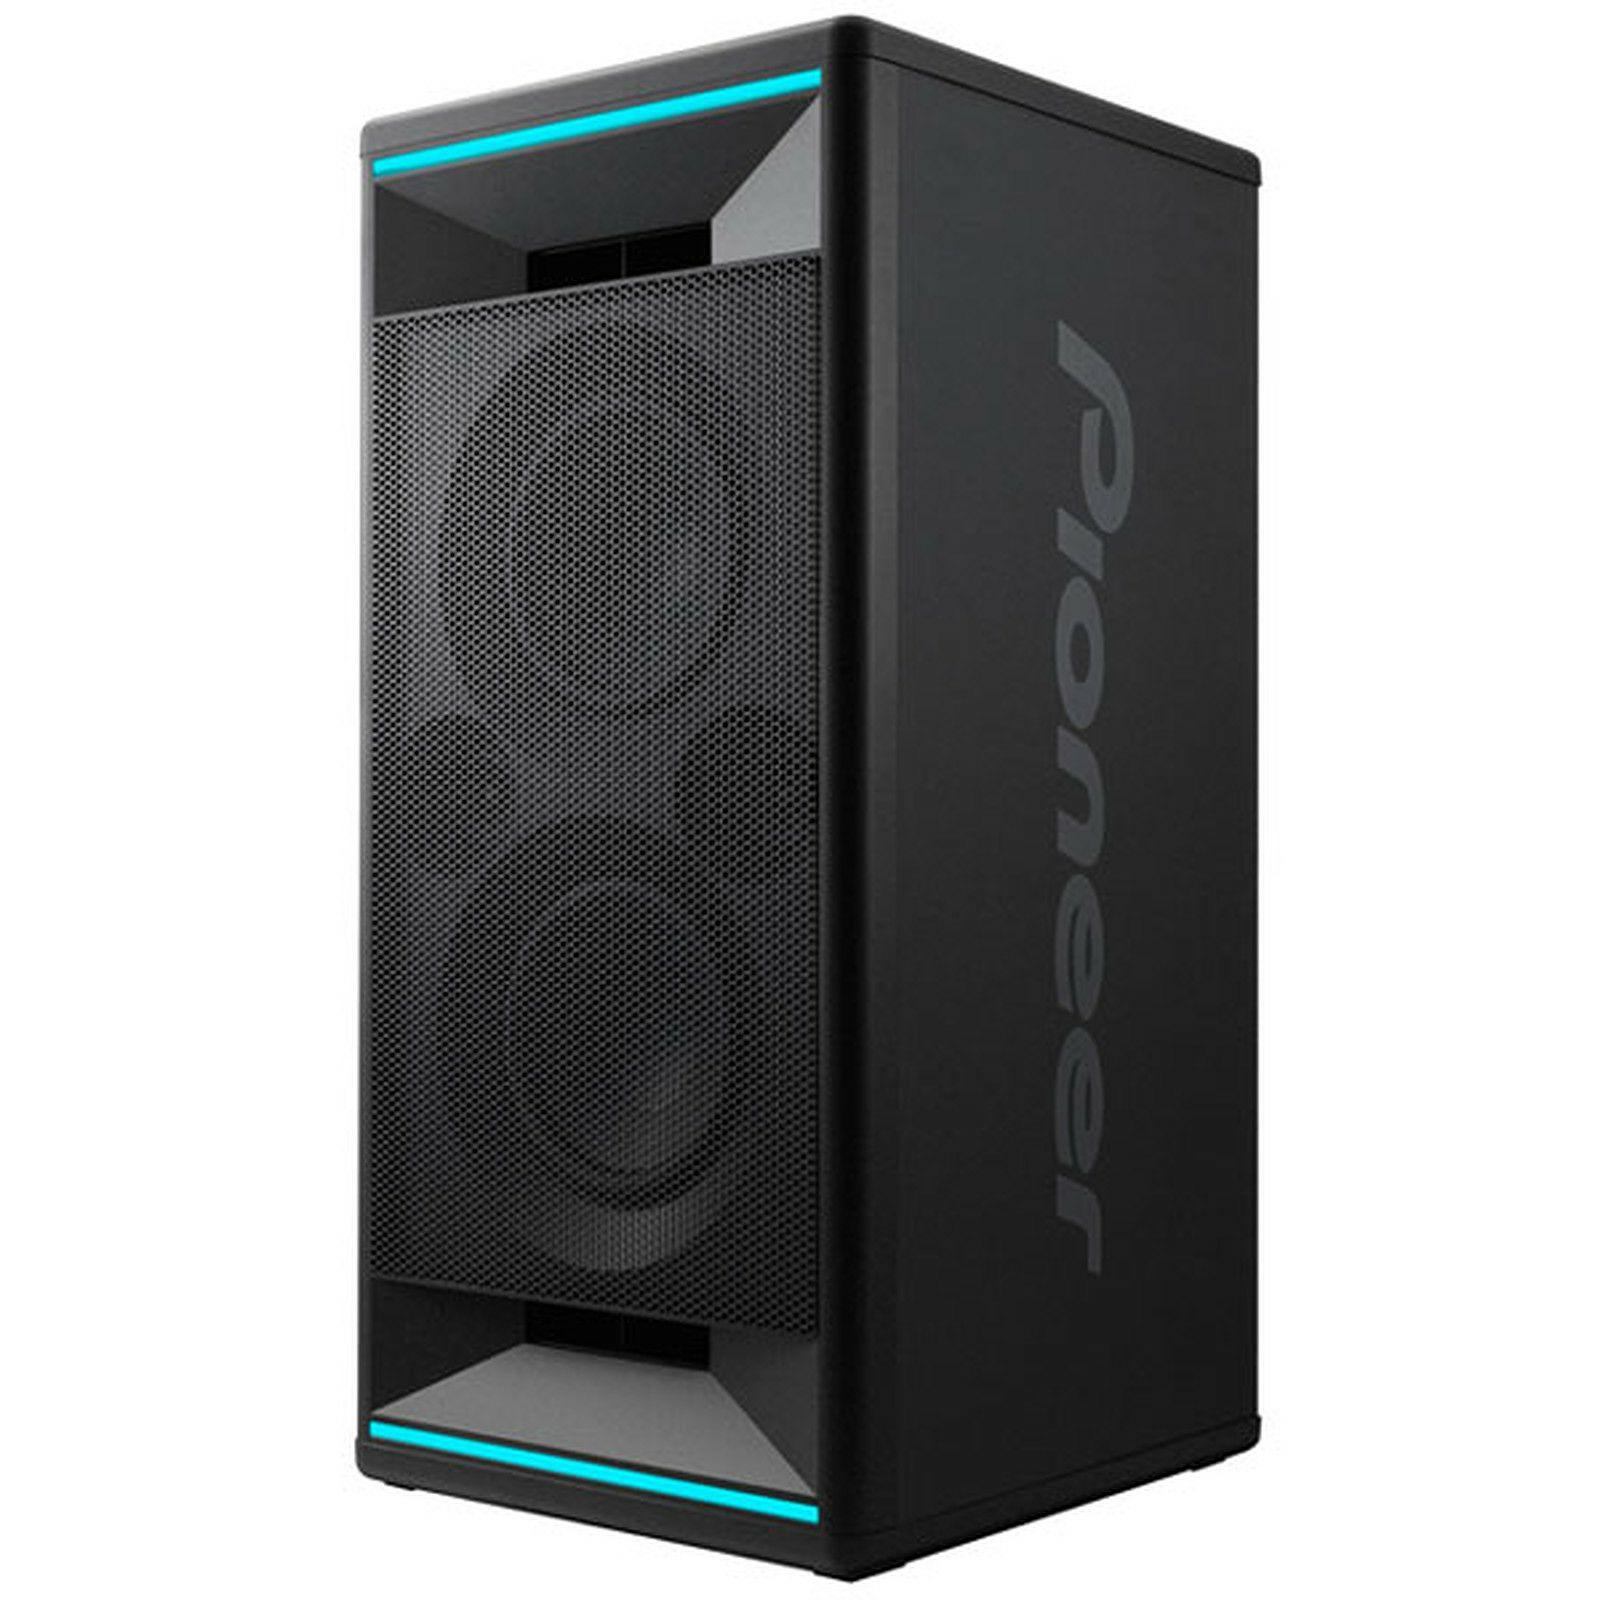 Pioneer Club7: Bluetooth Lautsprecher (2-Wege, 2x 5cm Hochtöner, 2x 18cm Tieftöner, 100W/100W, LED Beleuchtung)